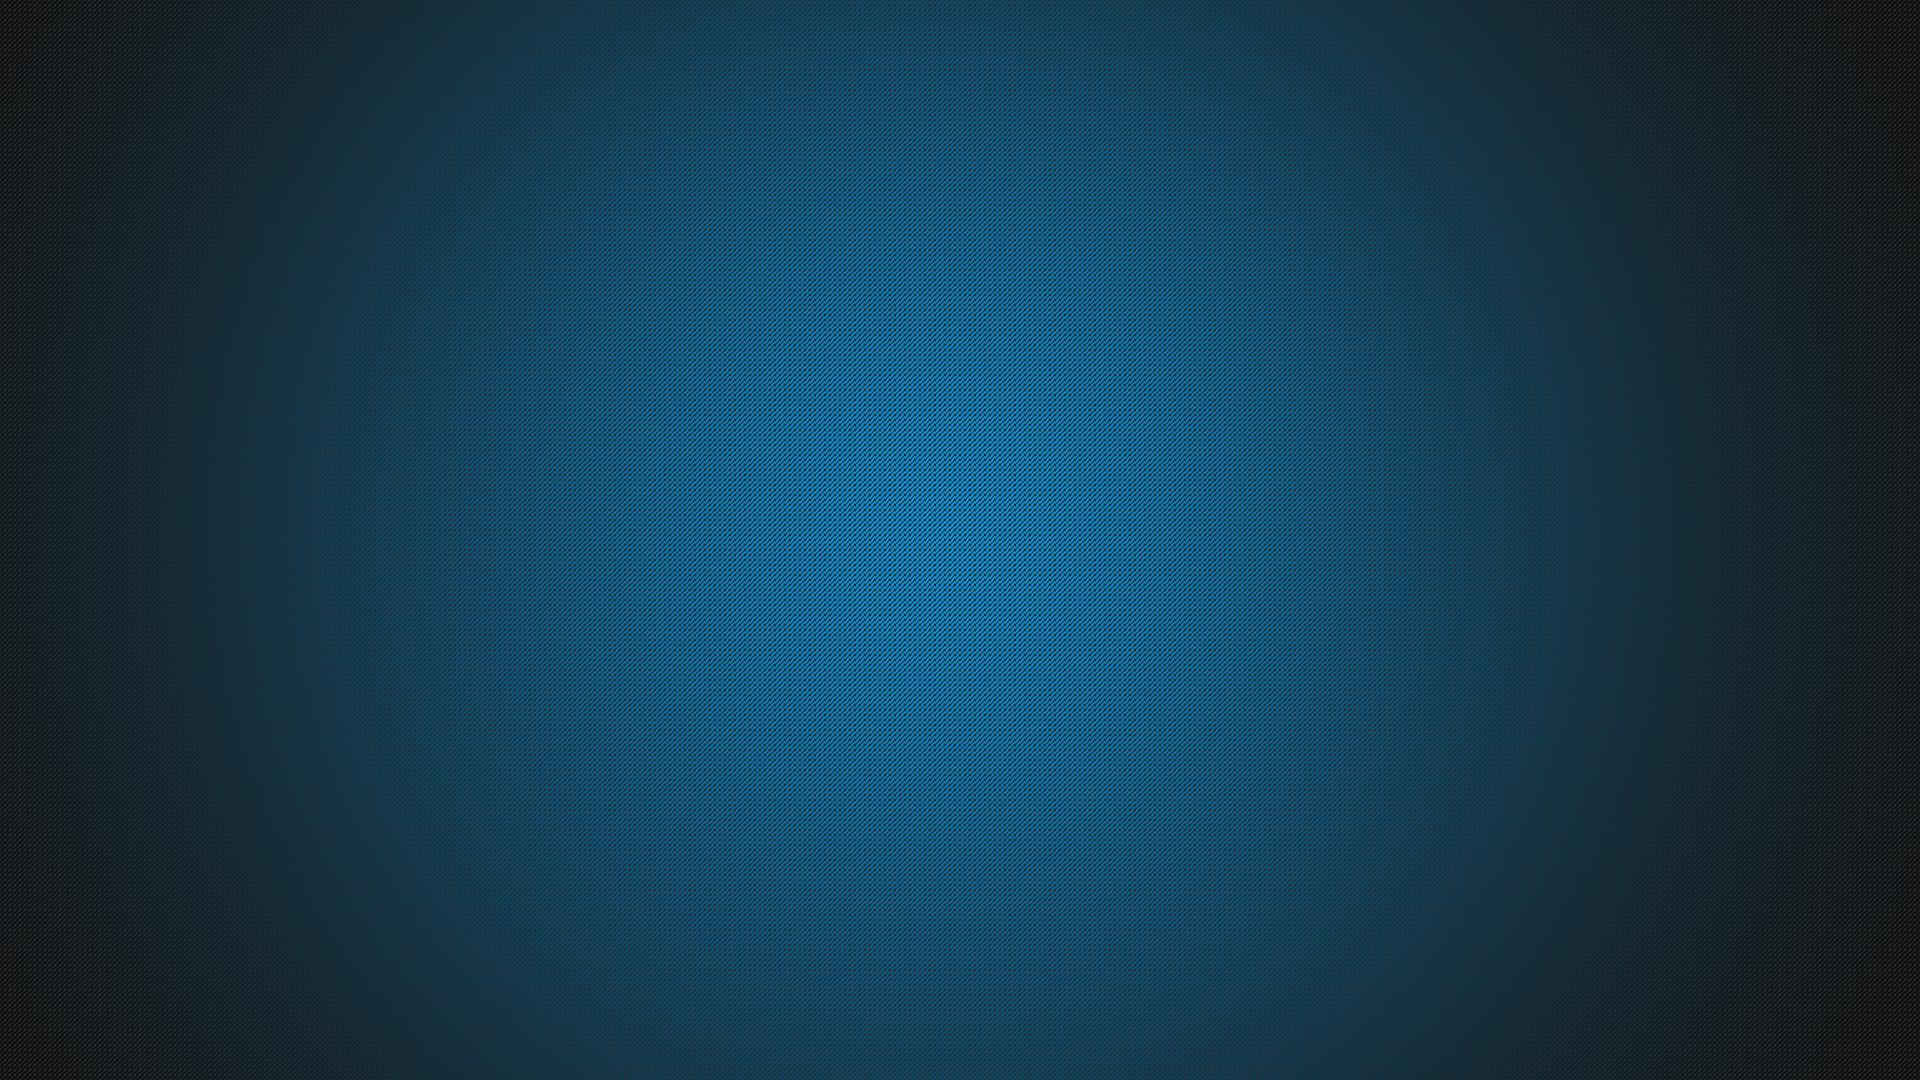 Black and blue wallpaper 1920x1080 by phantomghost1525 on deviantart